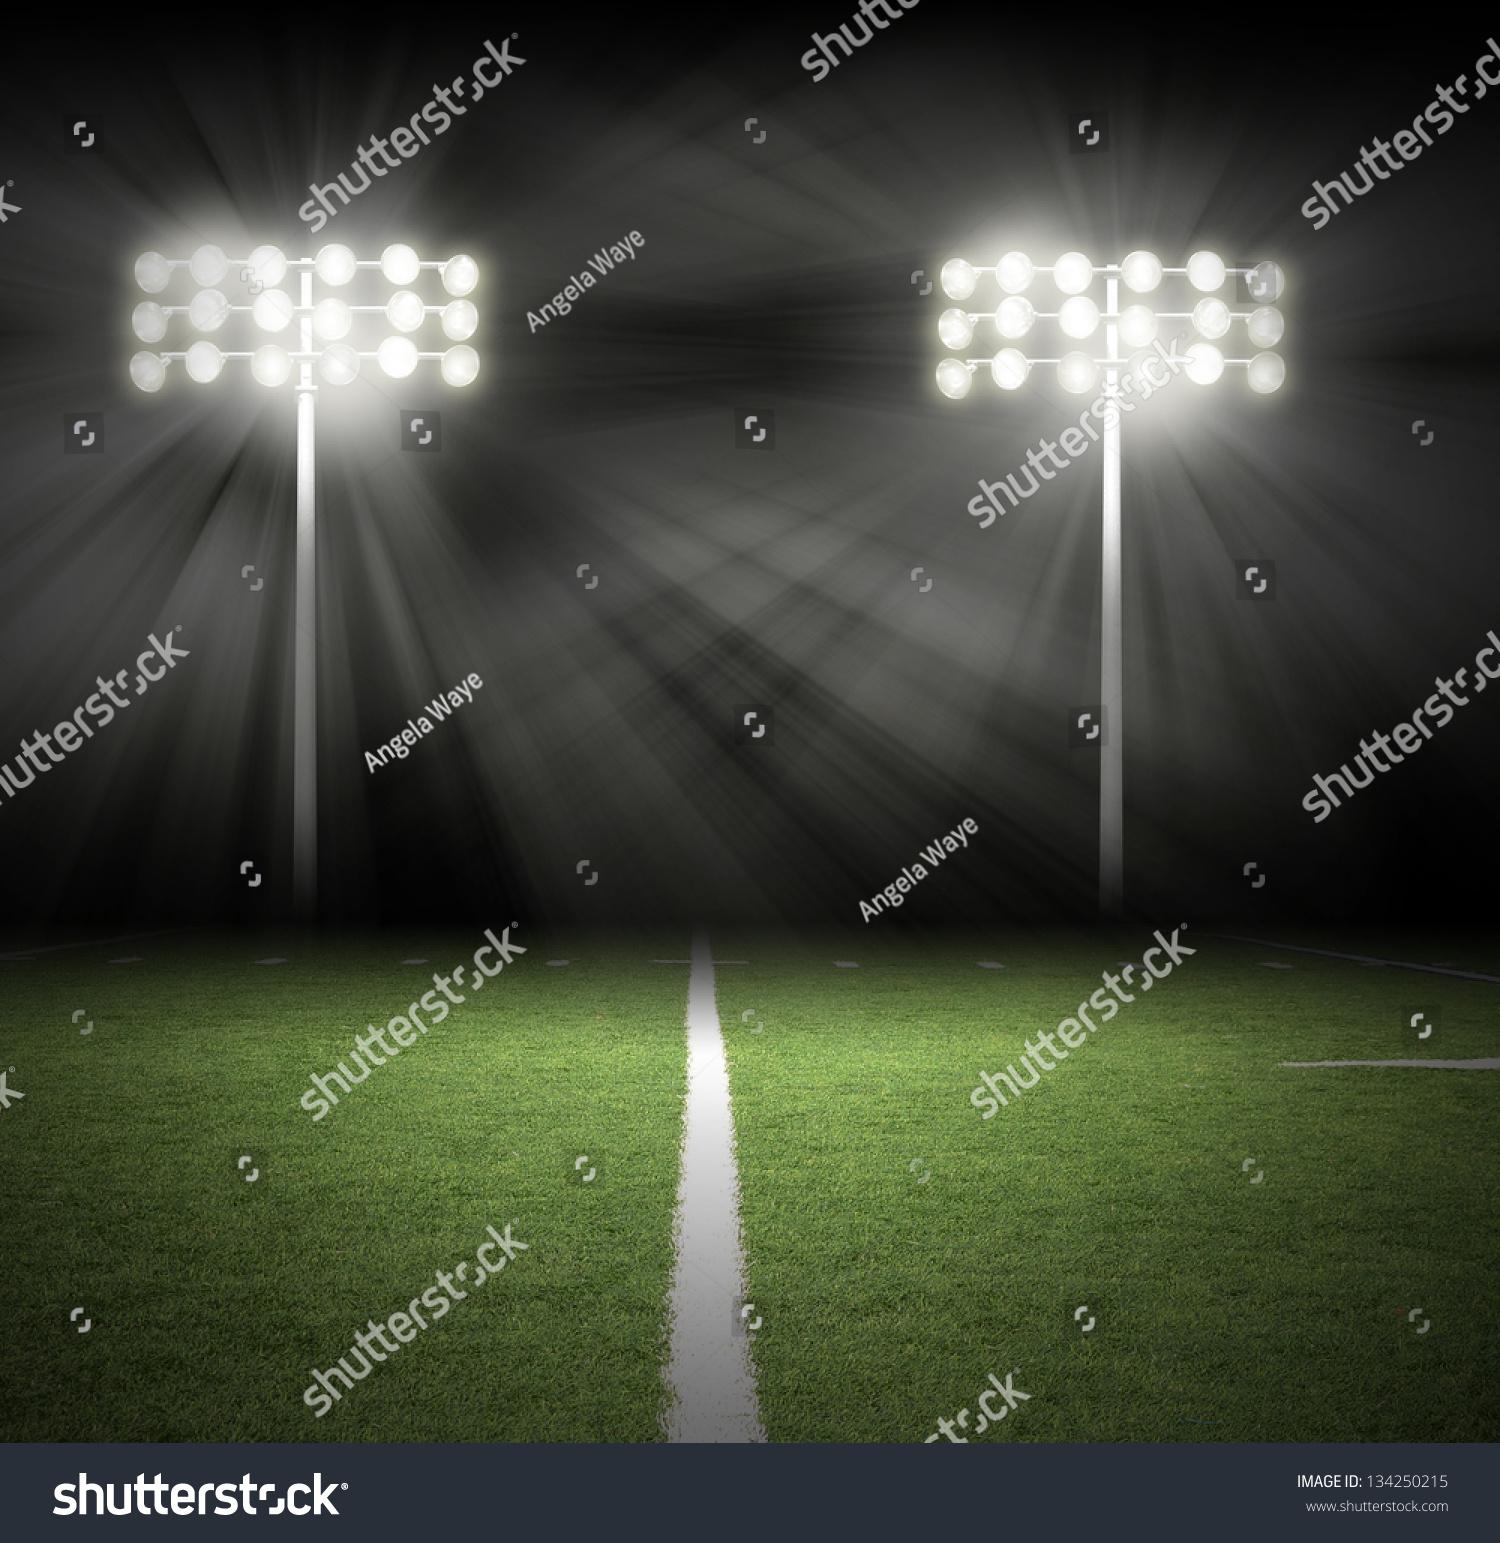 Stadium Of Lights: Two Stadium Football Game Lights Shinning Stock Photo